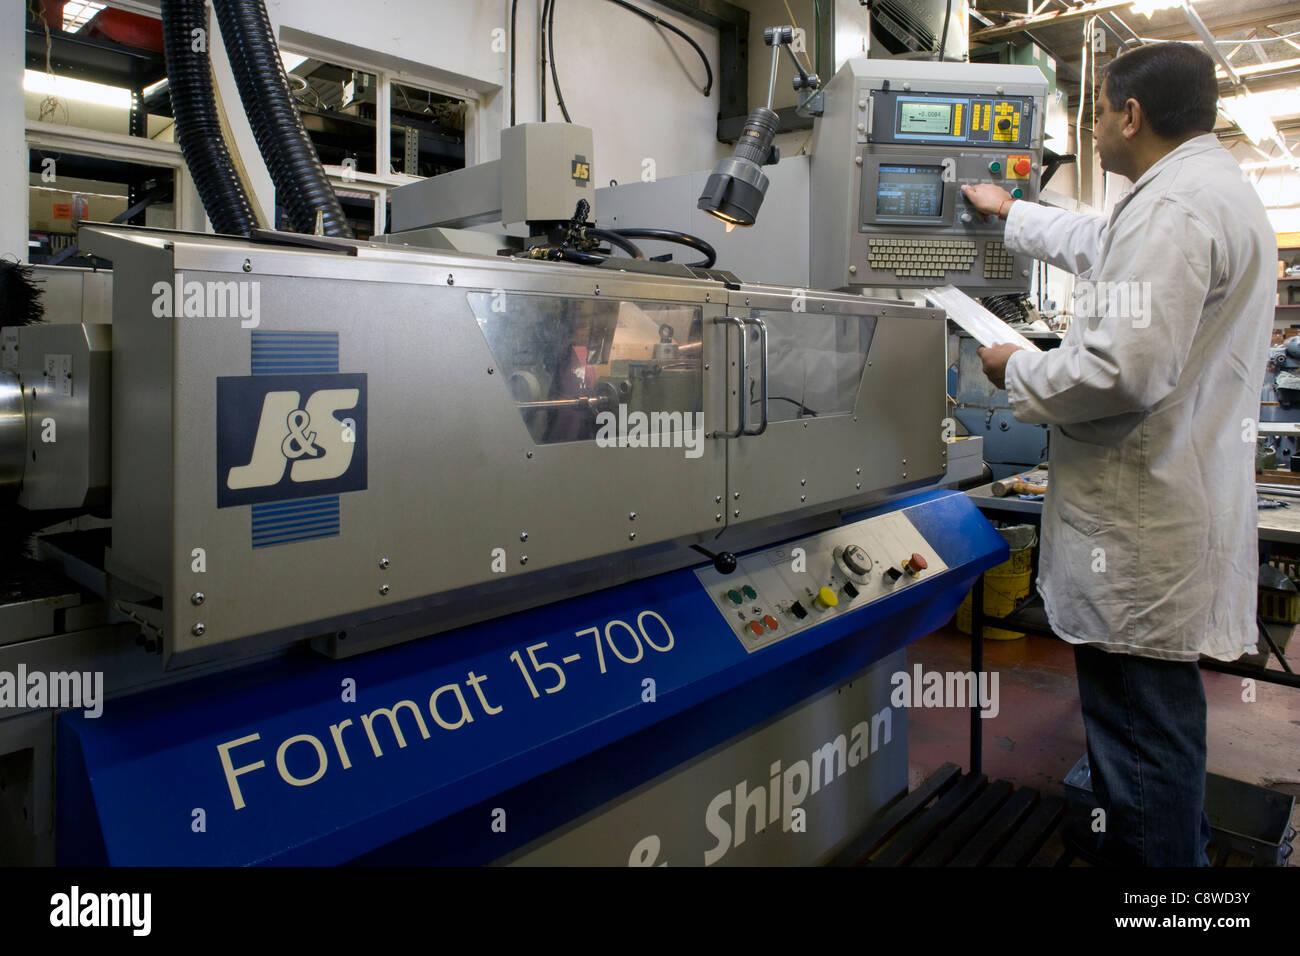 engineer prepares a metal grinding machine for work & programs - Stock Image